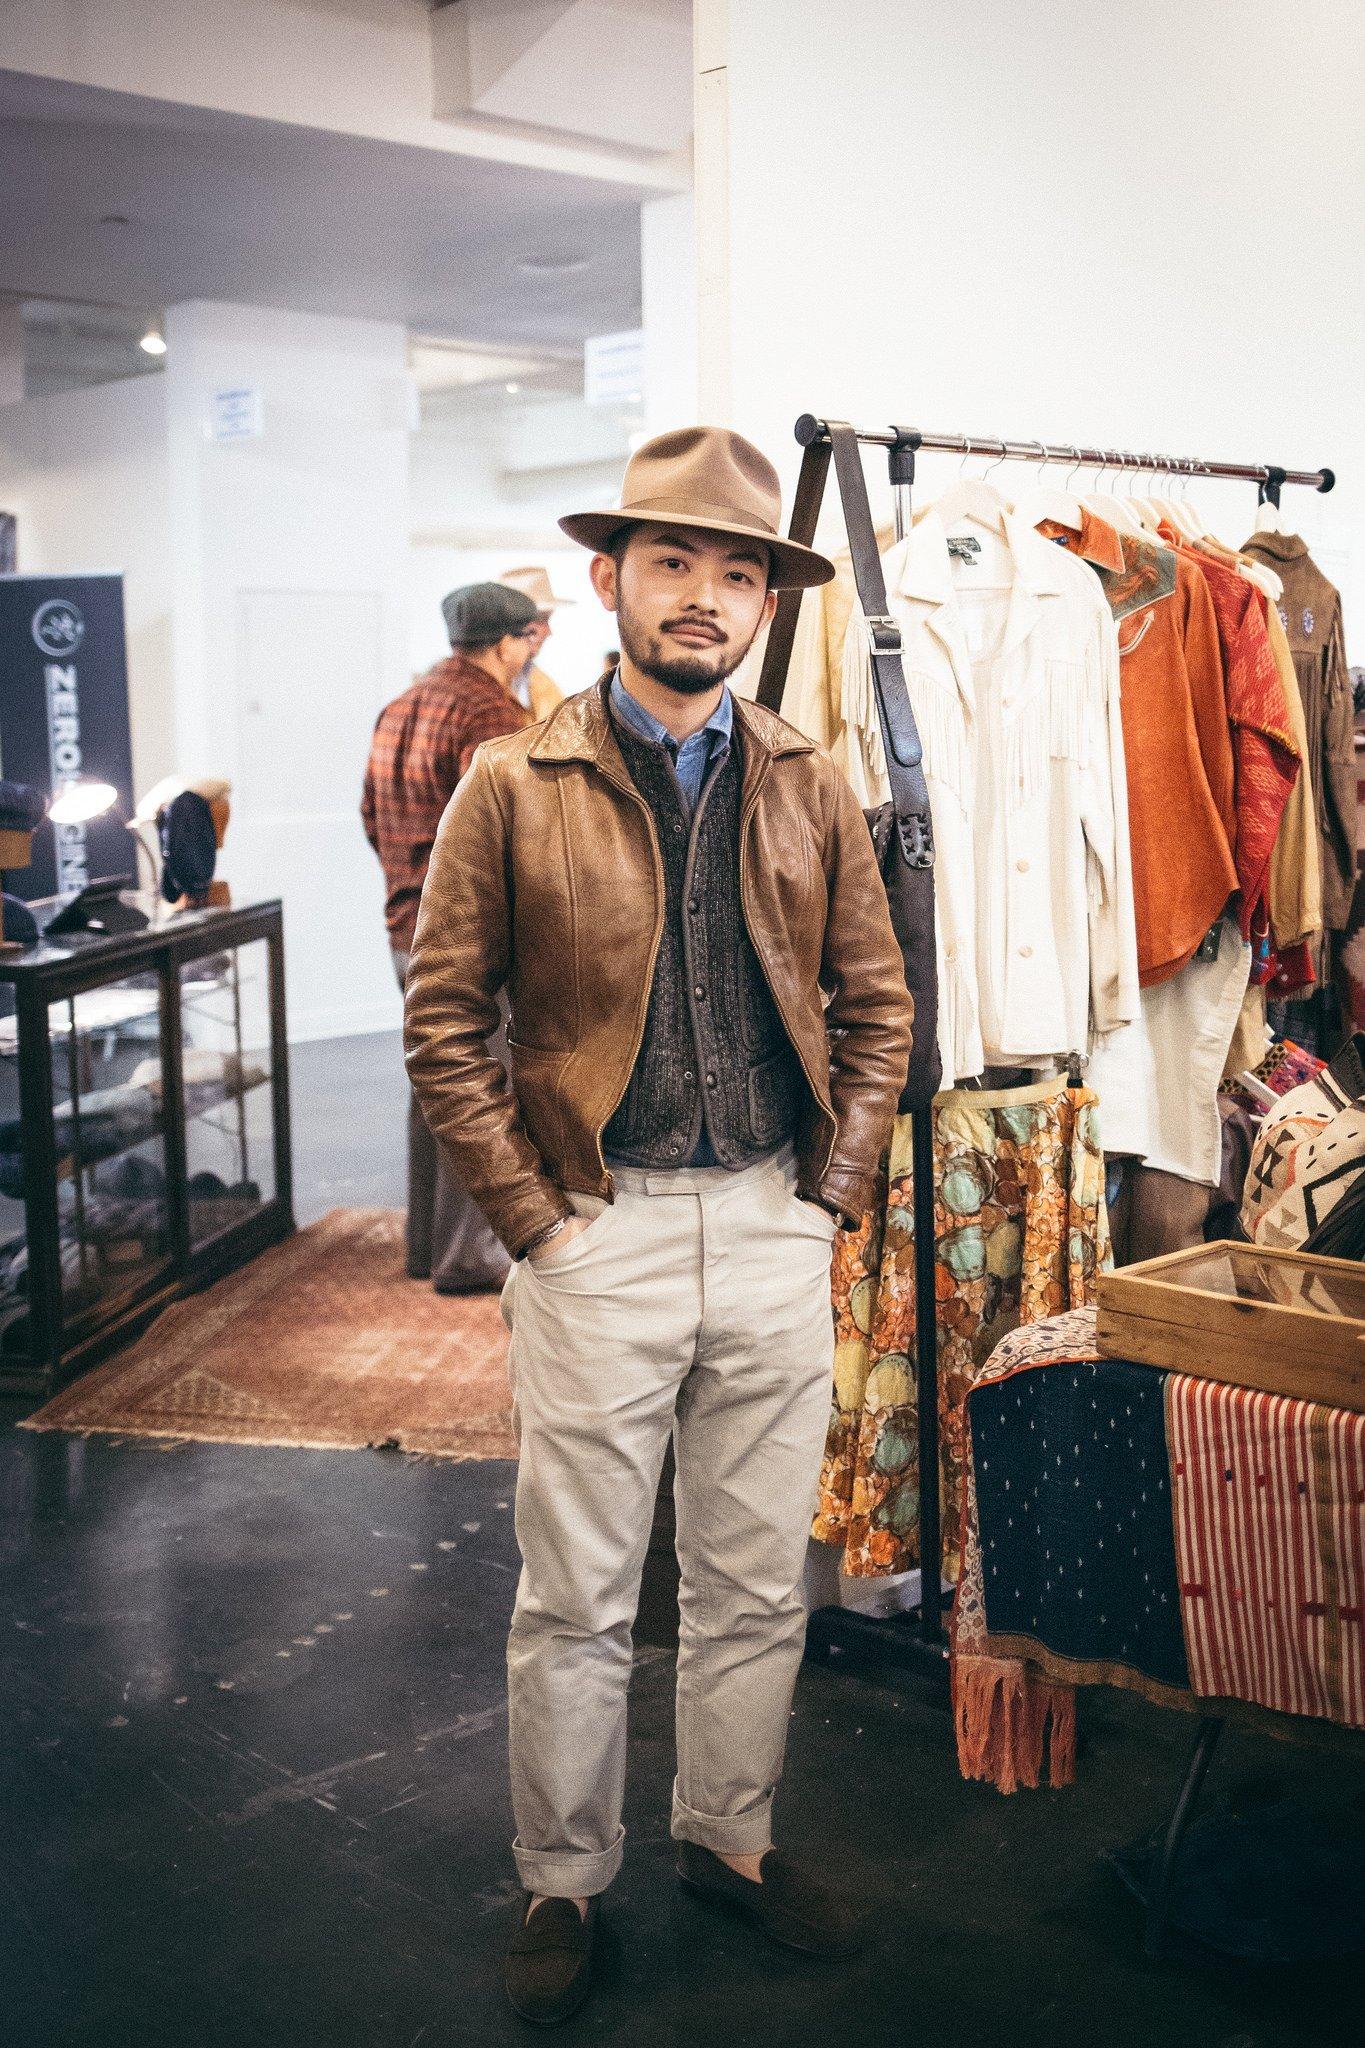 5a1a9acf94 Chapéu Fedora: Como usar e onde comprar esse chapéu masculino